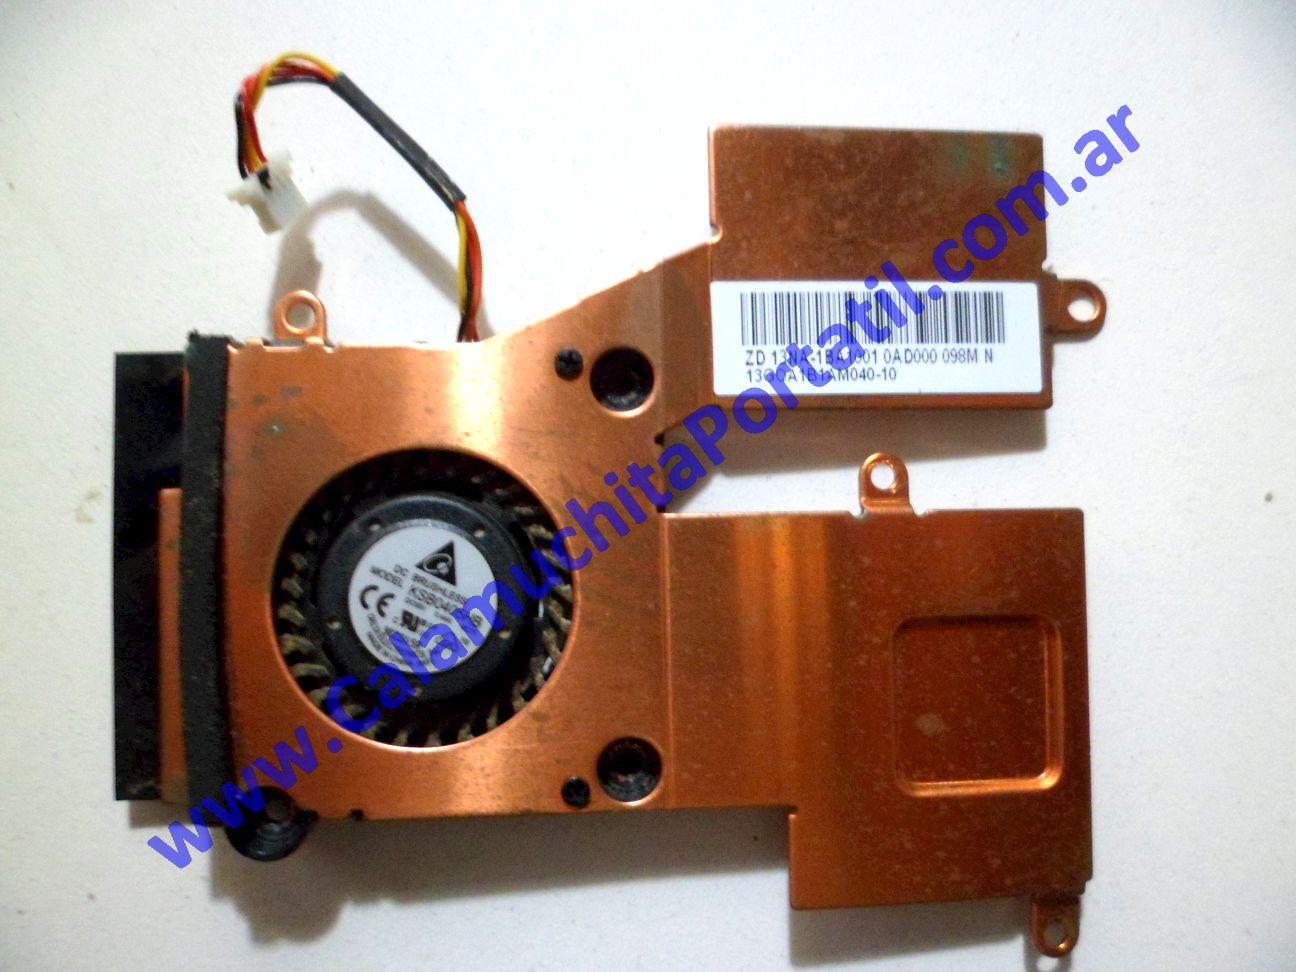 0088VDA Cooler C/Disipador Asus Eee PC 1005HA